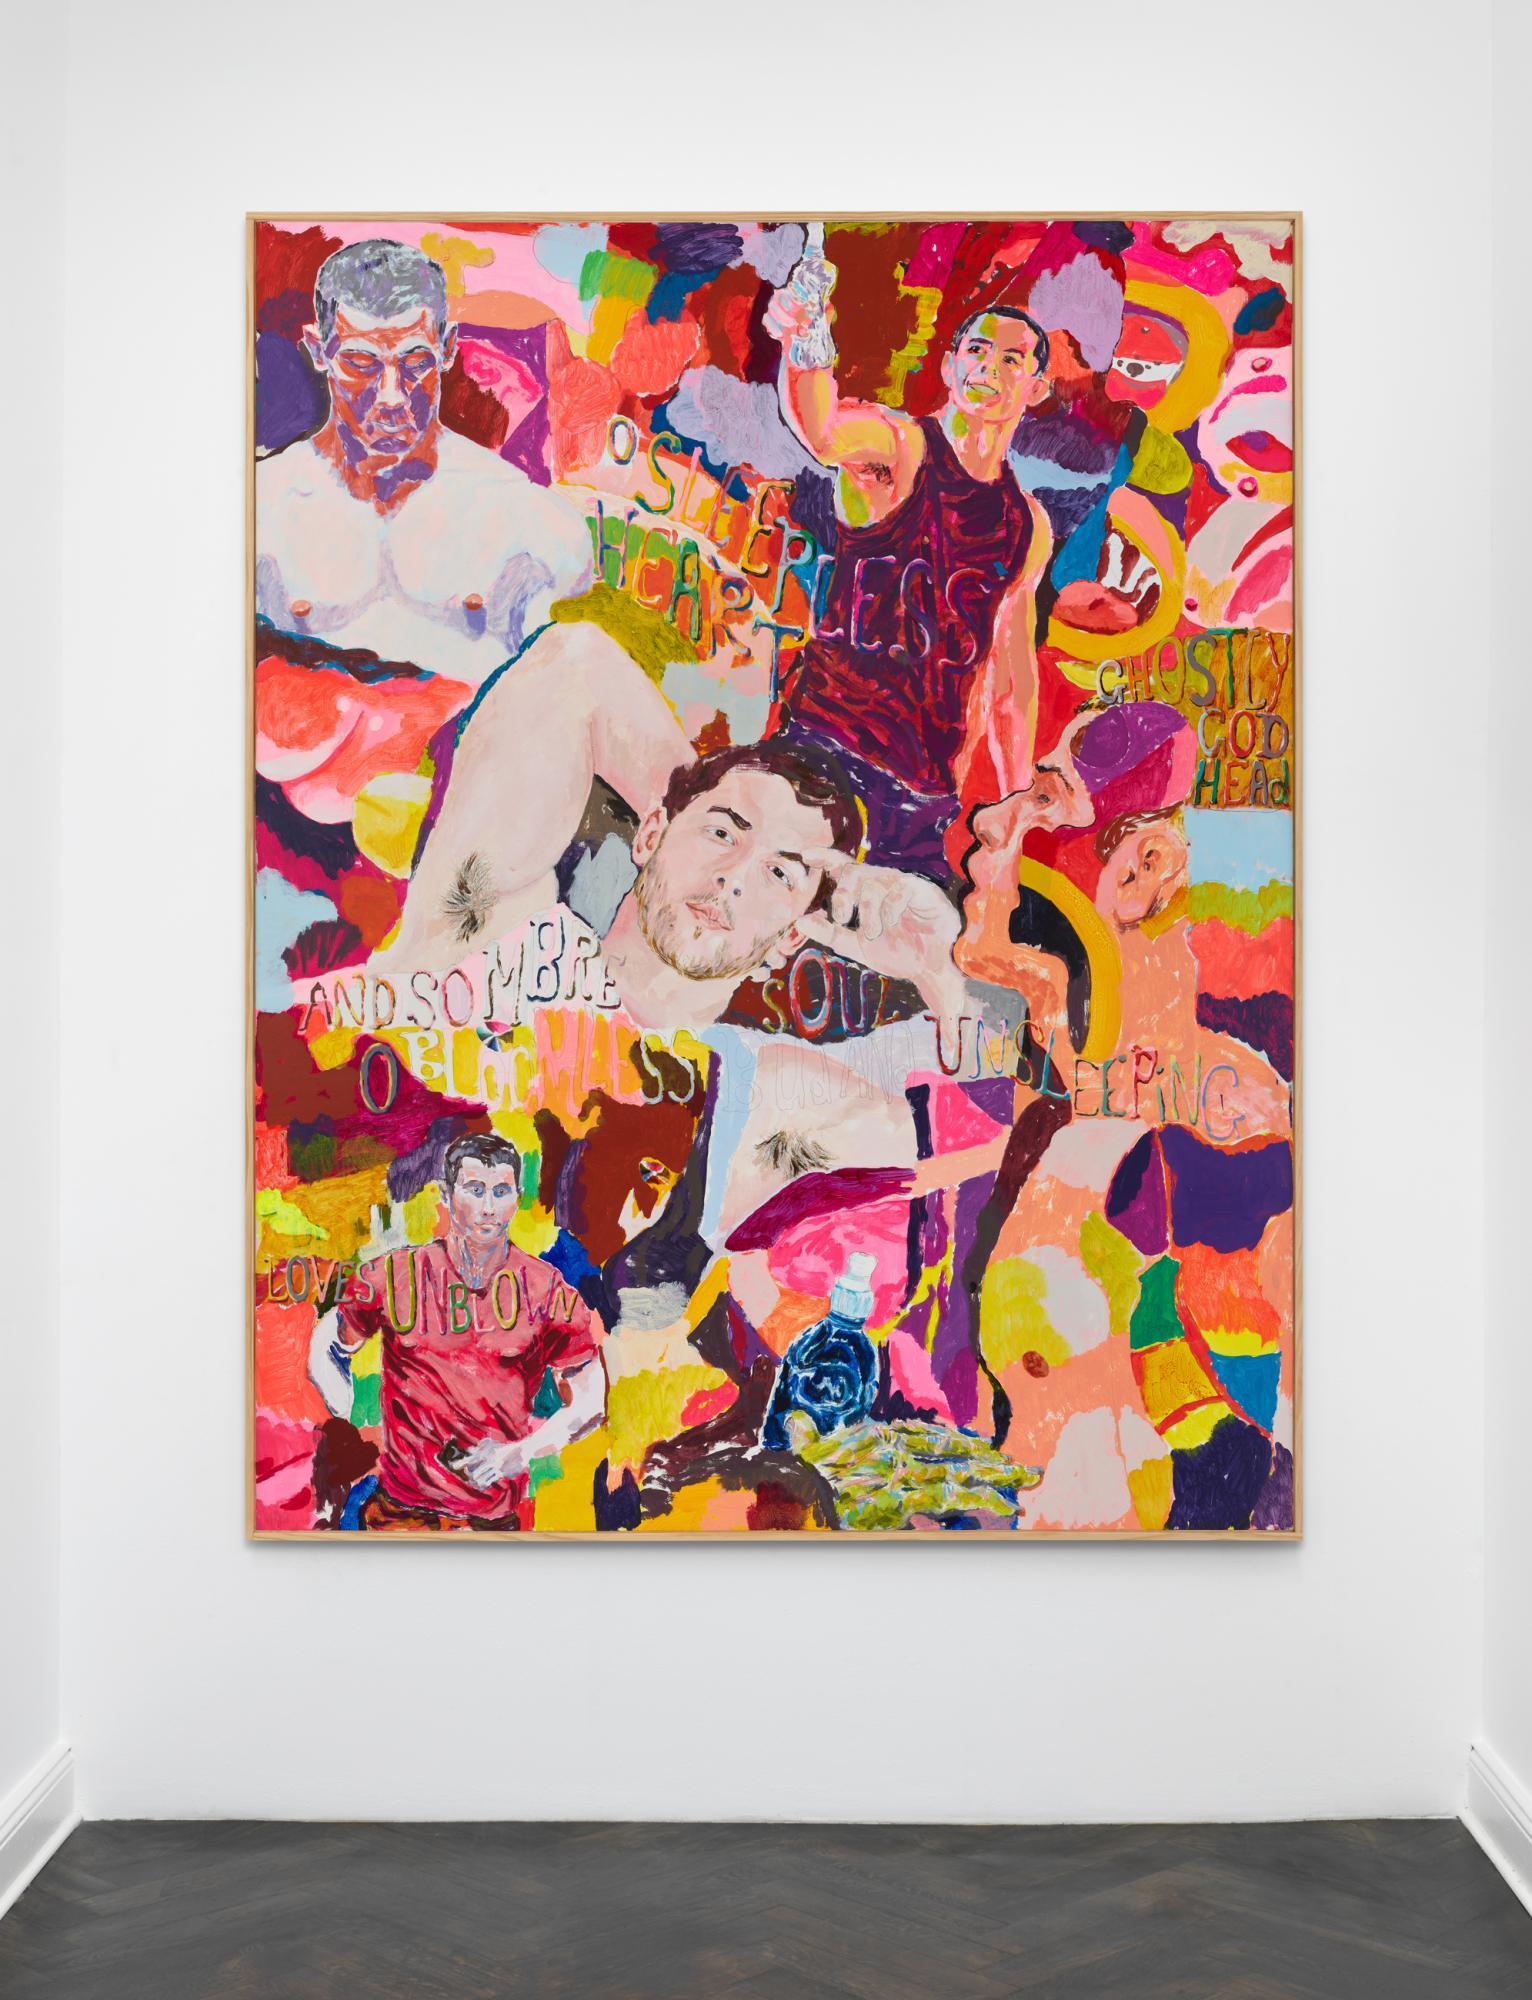 Richard Hawkins, /Sombre Soul Unsleeping/, 2020, acrylic on panel in artist  frame 223.5 x 178 x 5 cm